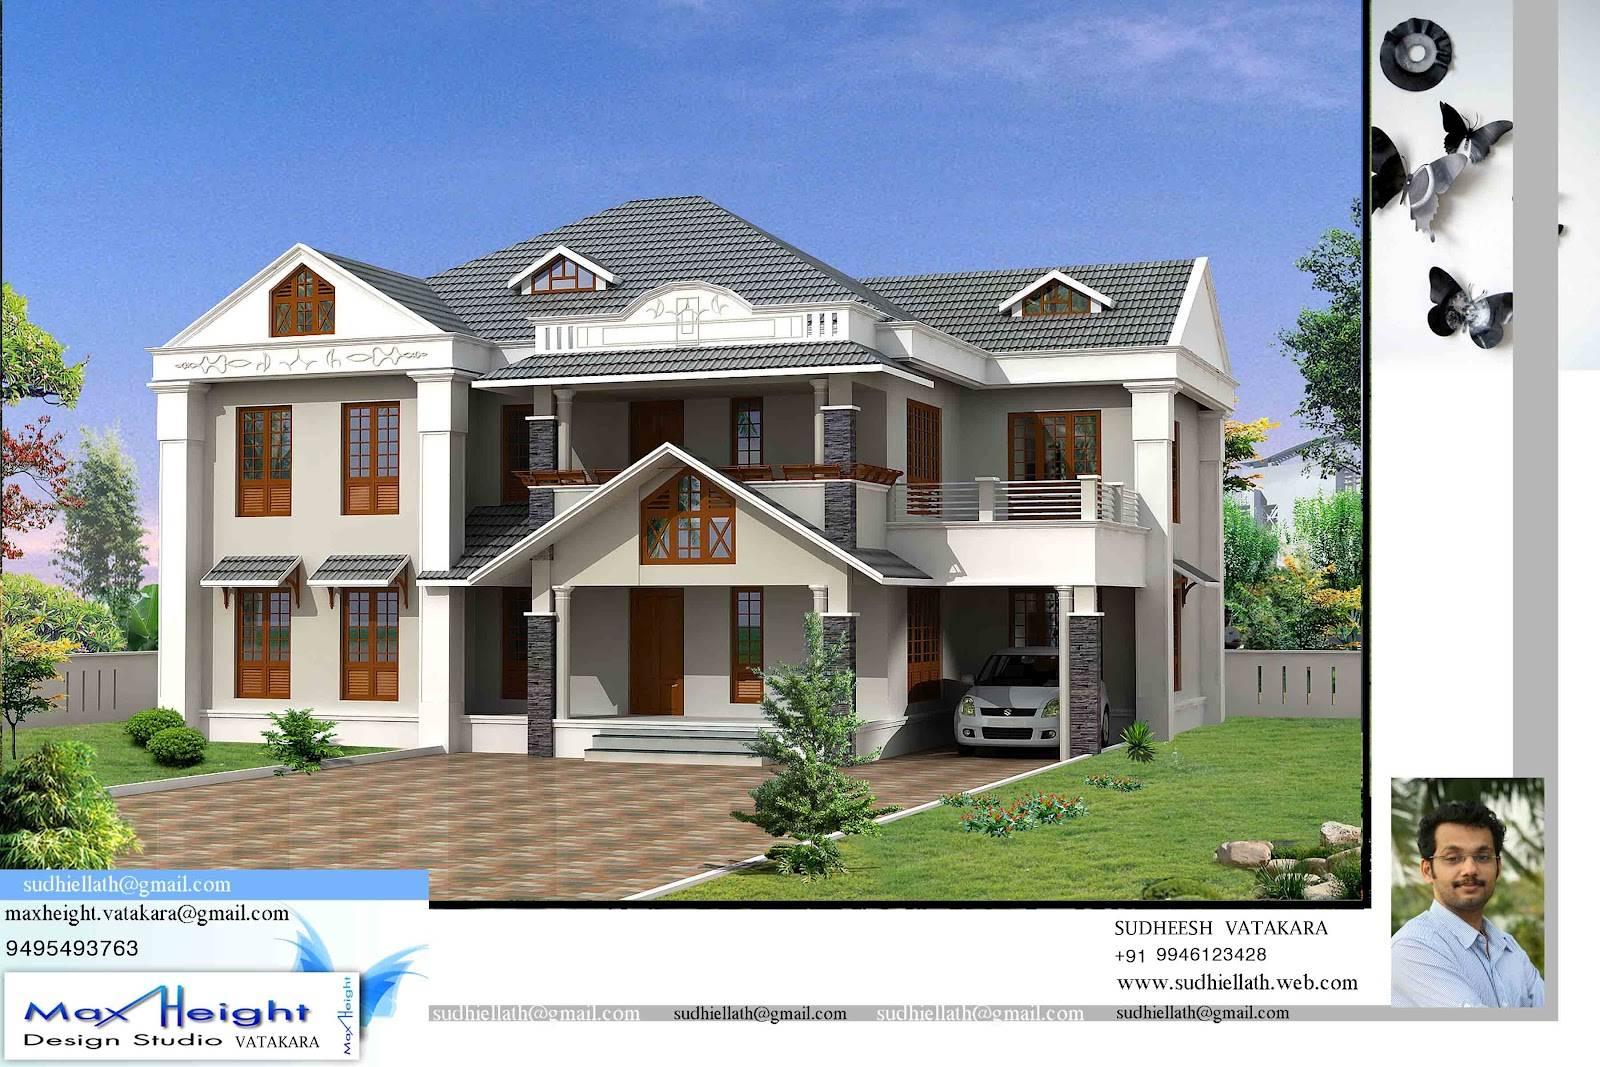 Amazing Smart Placement House Design Models Ideas House Plans 12825 Largest Home Design Picture Inspirations Pitcheantrous